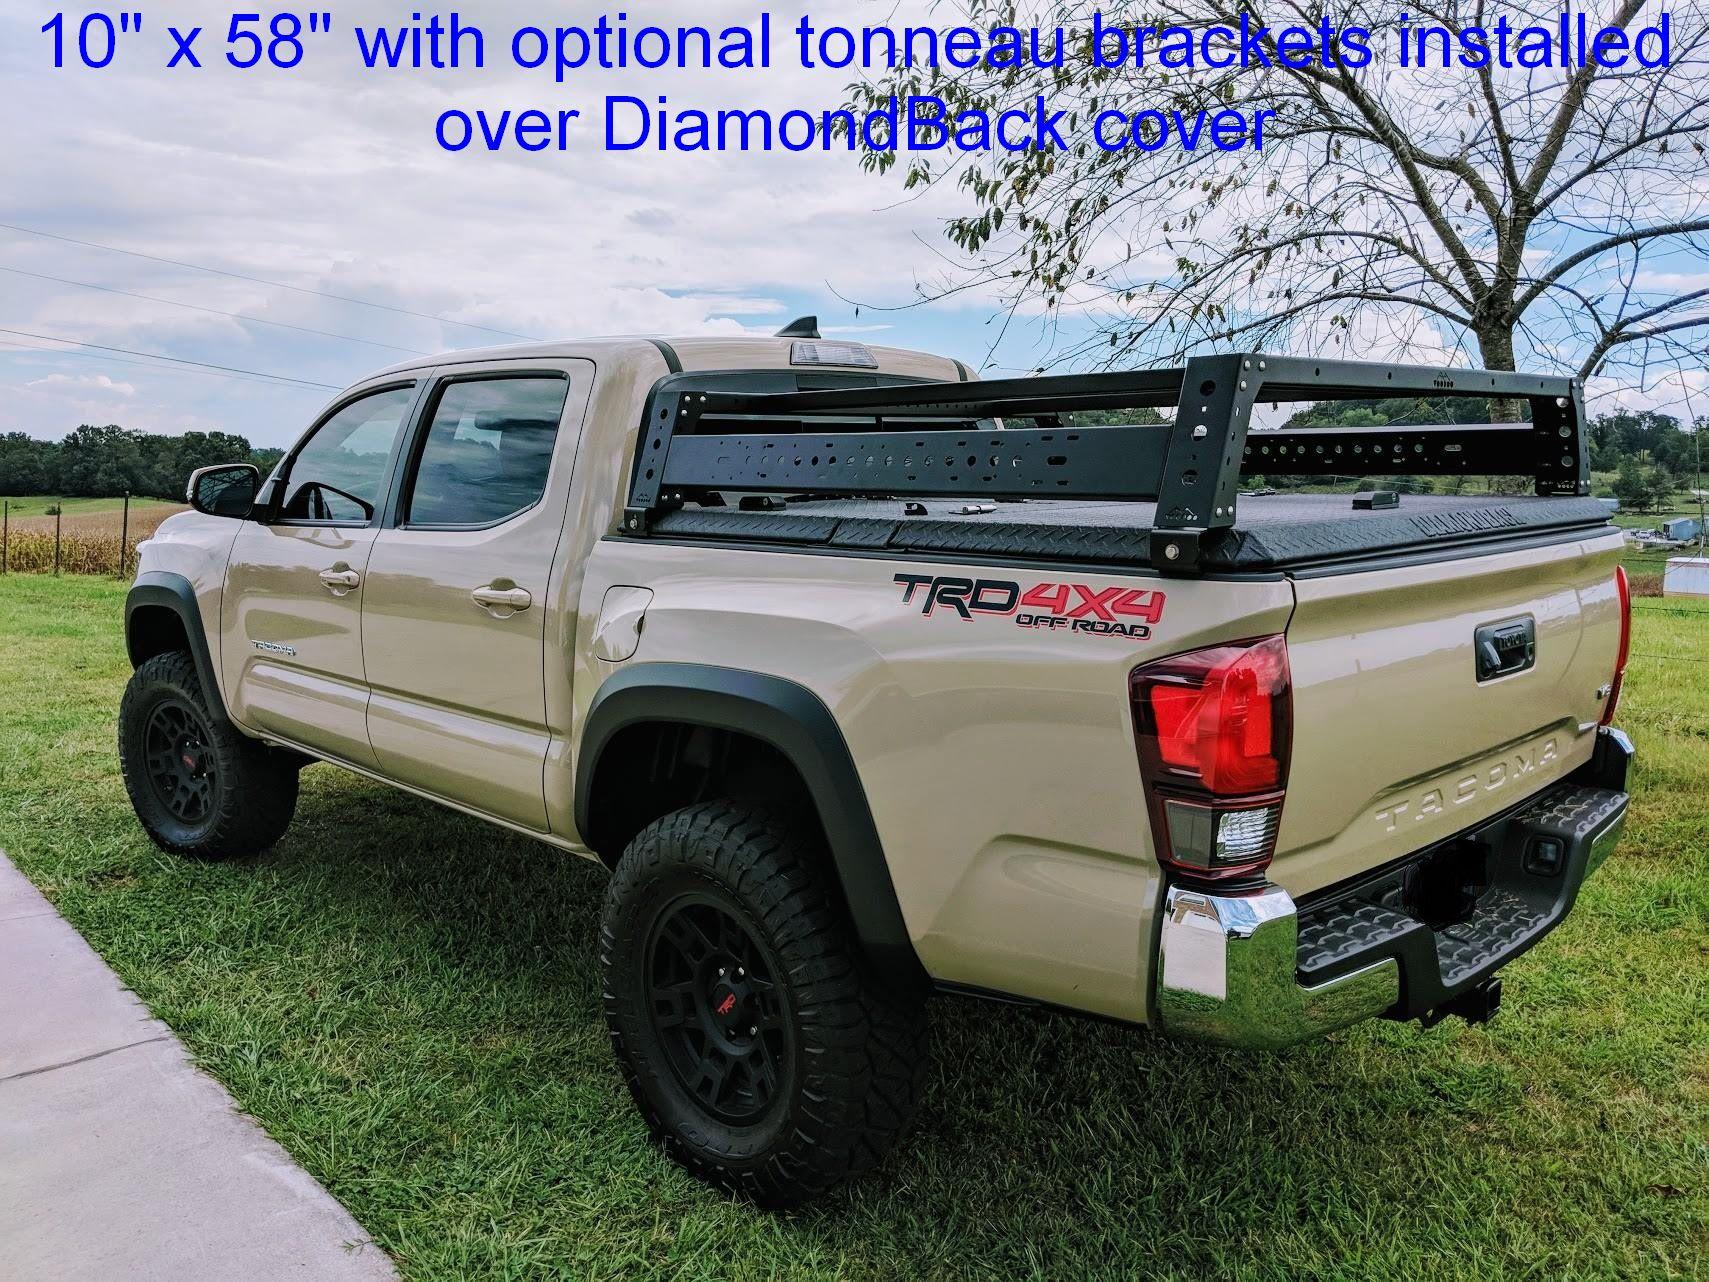 max modular taco max 10 high toyota tacoma bed rack max modular truck bed racks